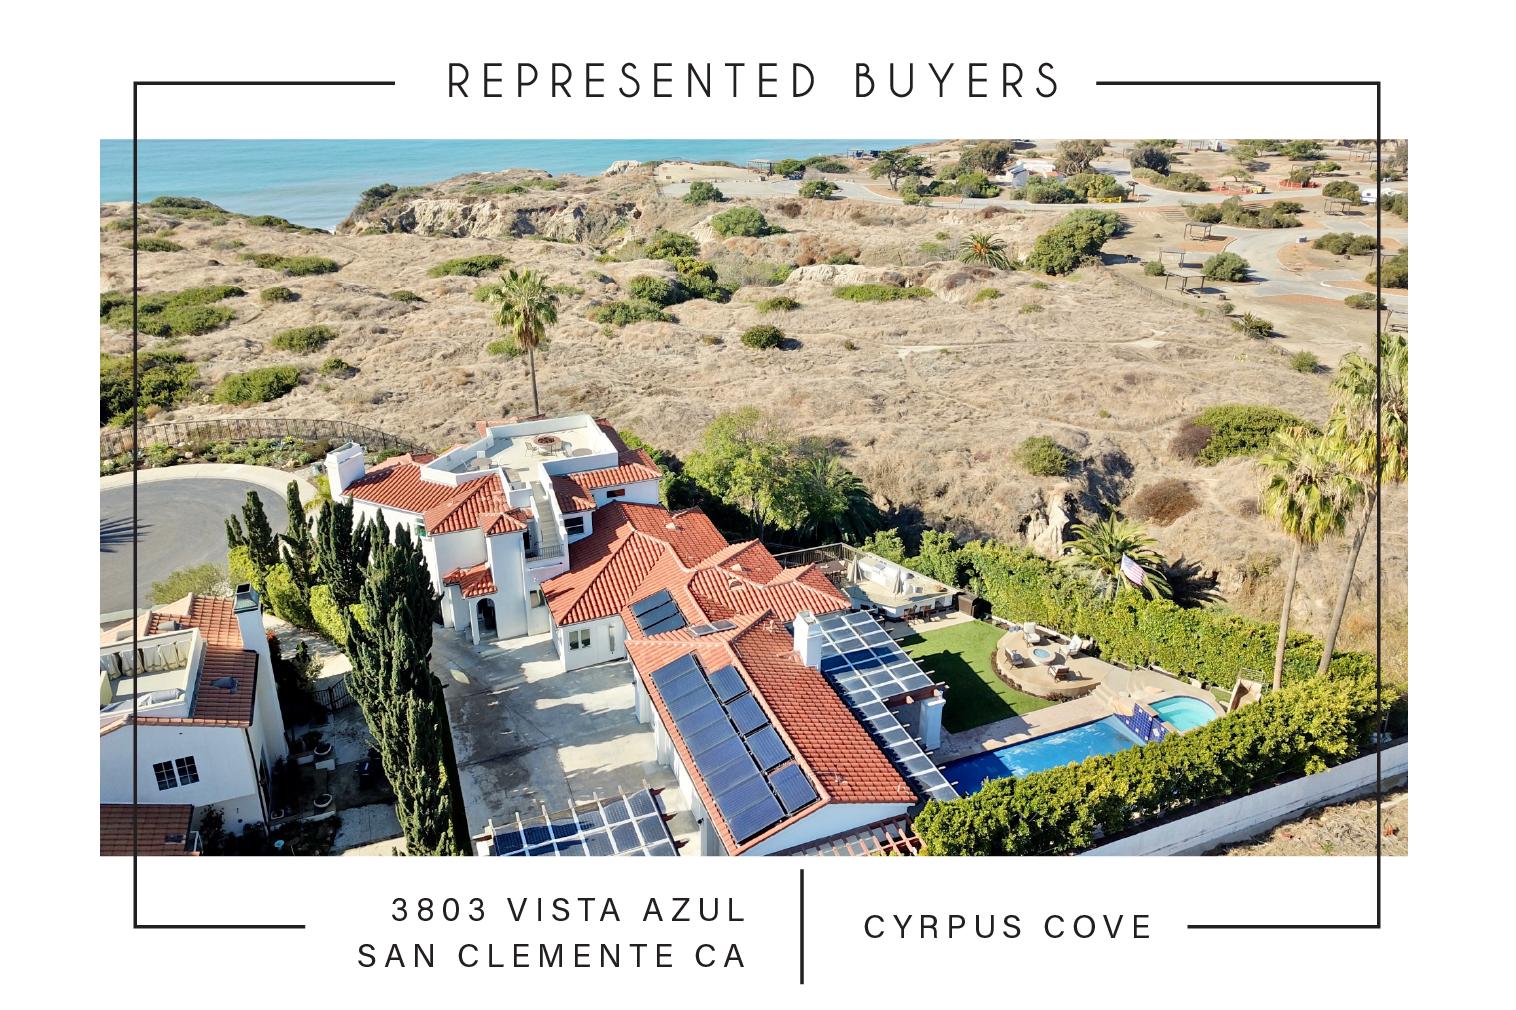 SOLD 7/30/2018  $3,700,000  3803 vista azul, San Clemente CA